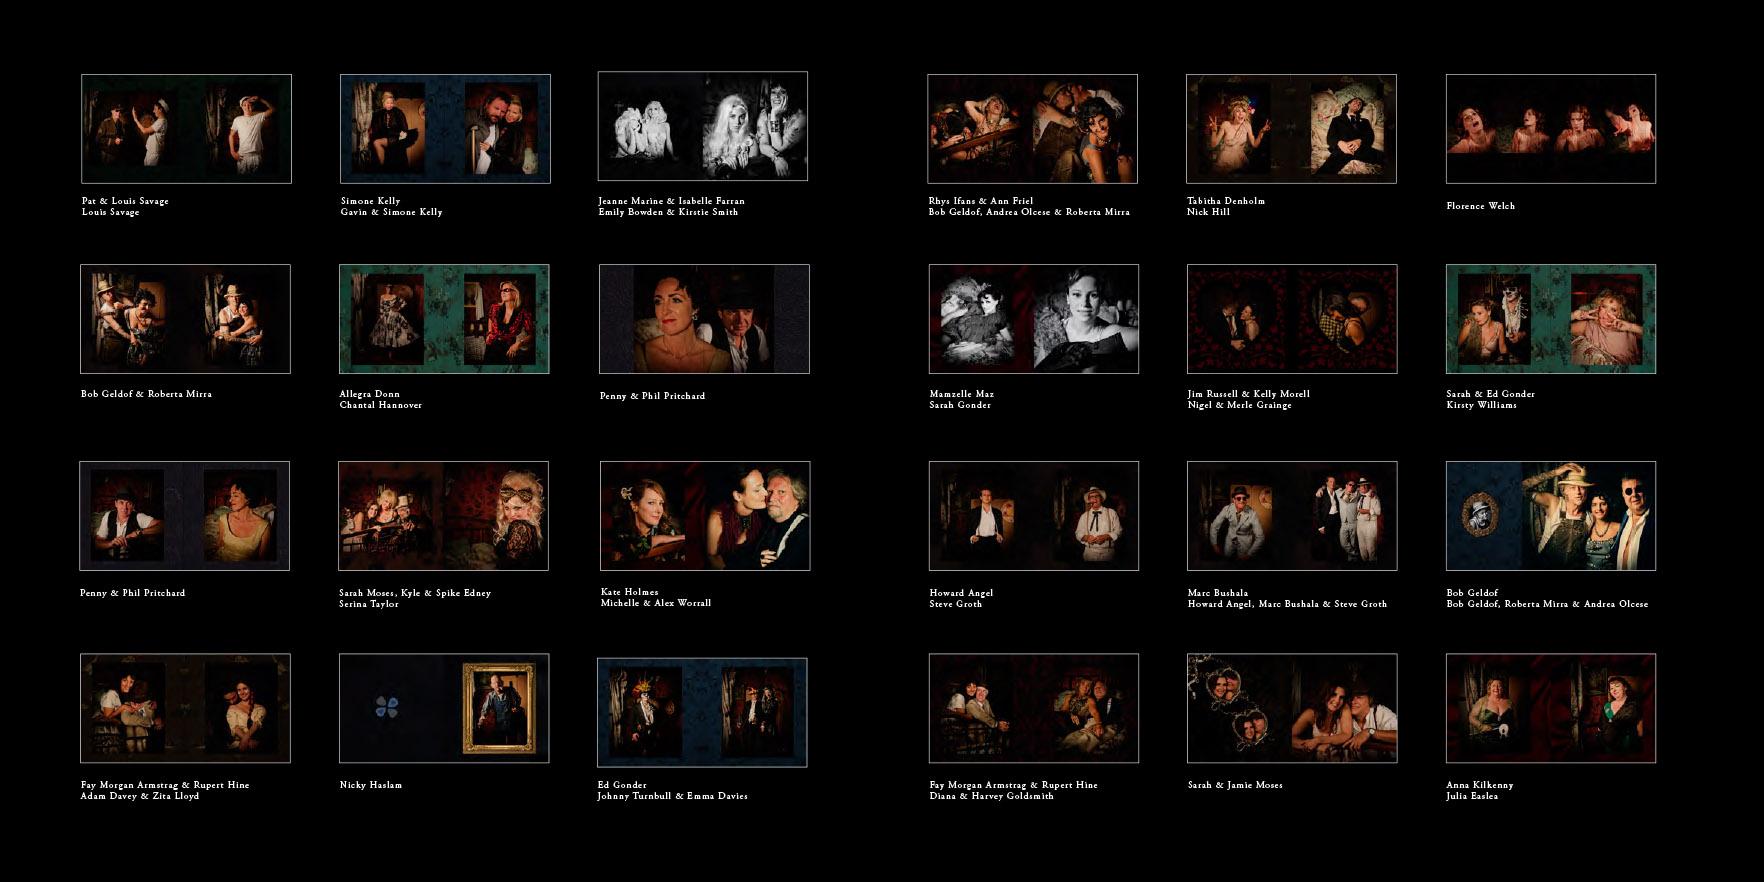 BobnPixieCutDown-40 copy.jpg